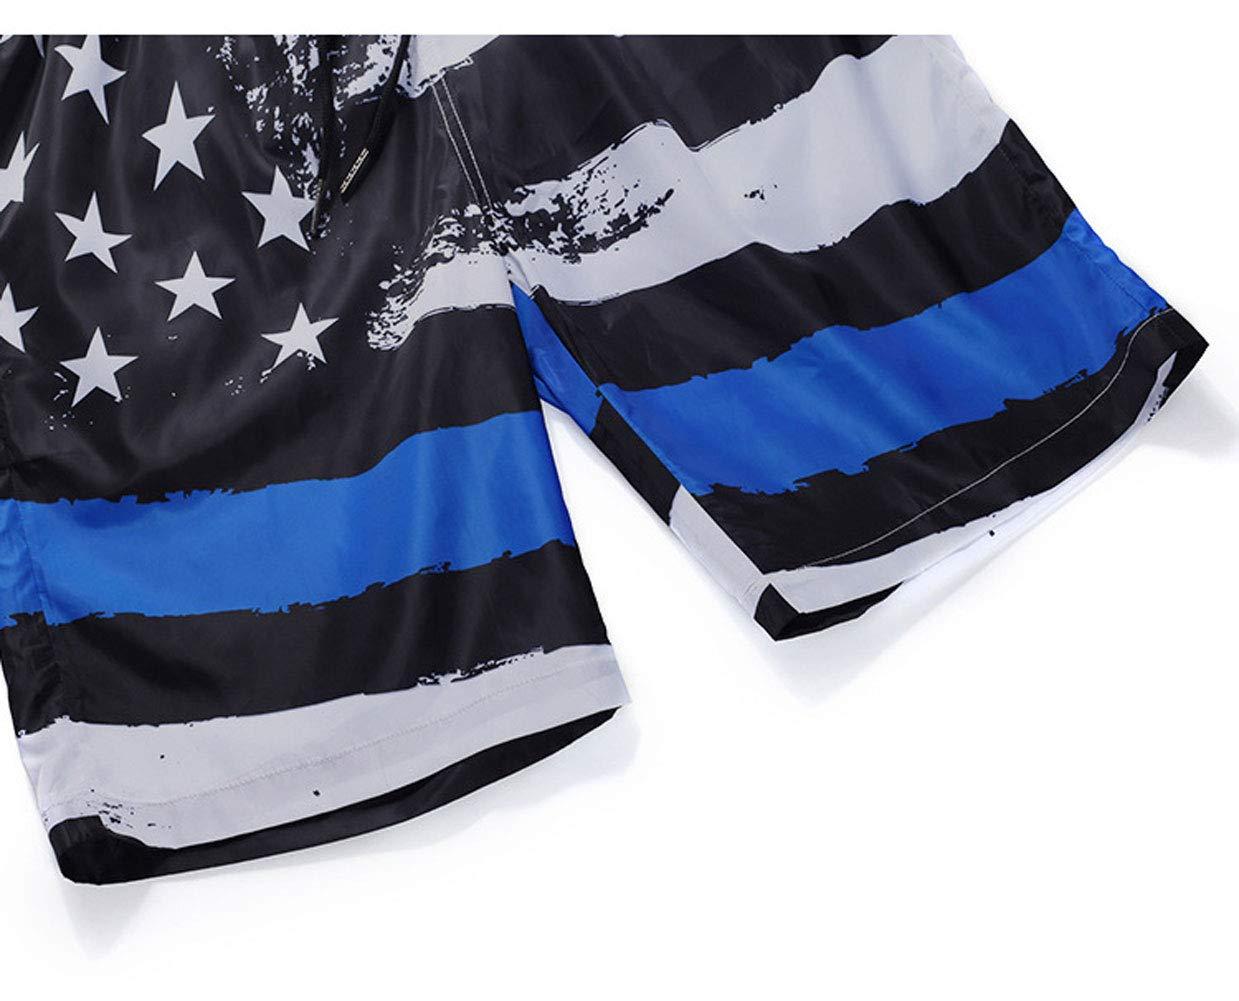 Ophestin Men Swimming Trunks Board Shorts - Quick Dry Beach Shorts with Fun Print Tropical Swim Trunks